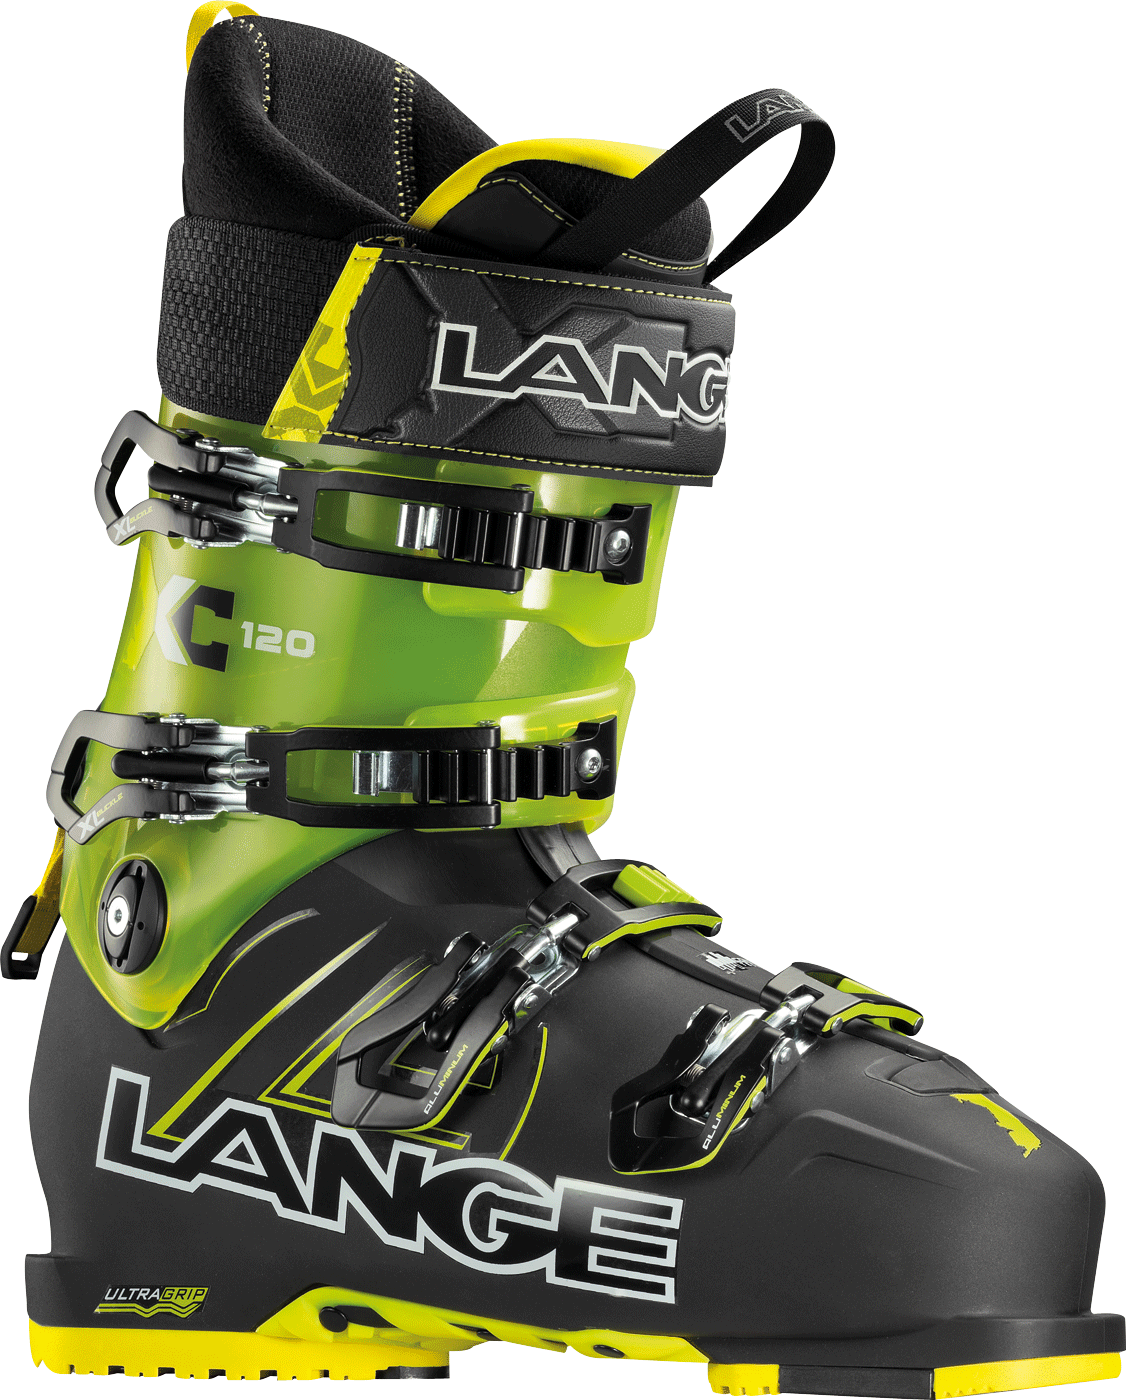 Lange XC 120 (2015-16)